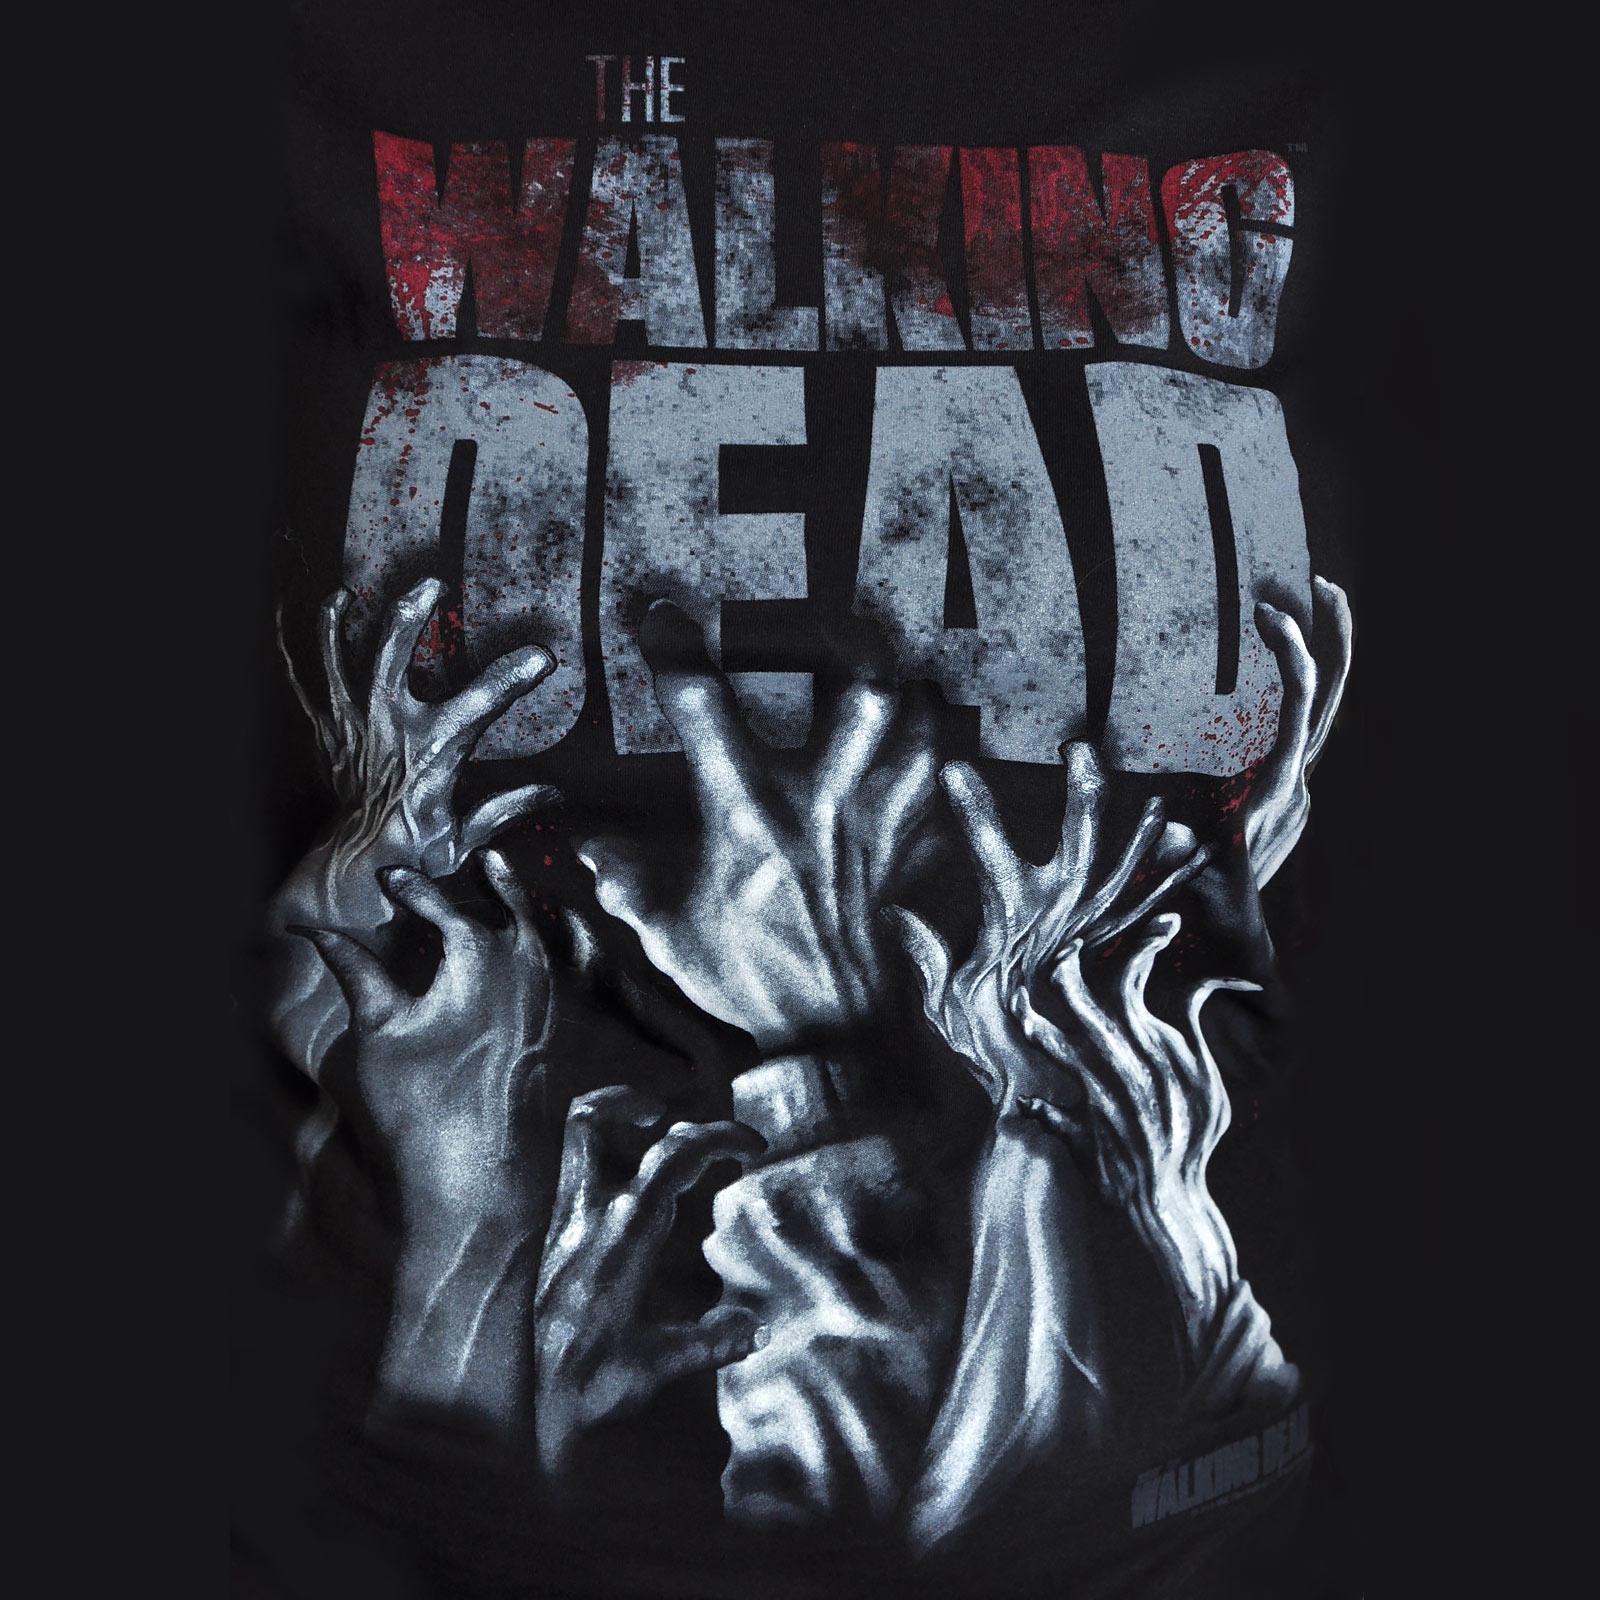 Walking Dead - Hands Blood Splatter Girlie Shirt schwarz